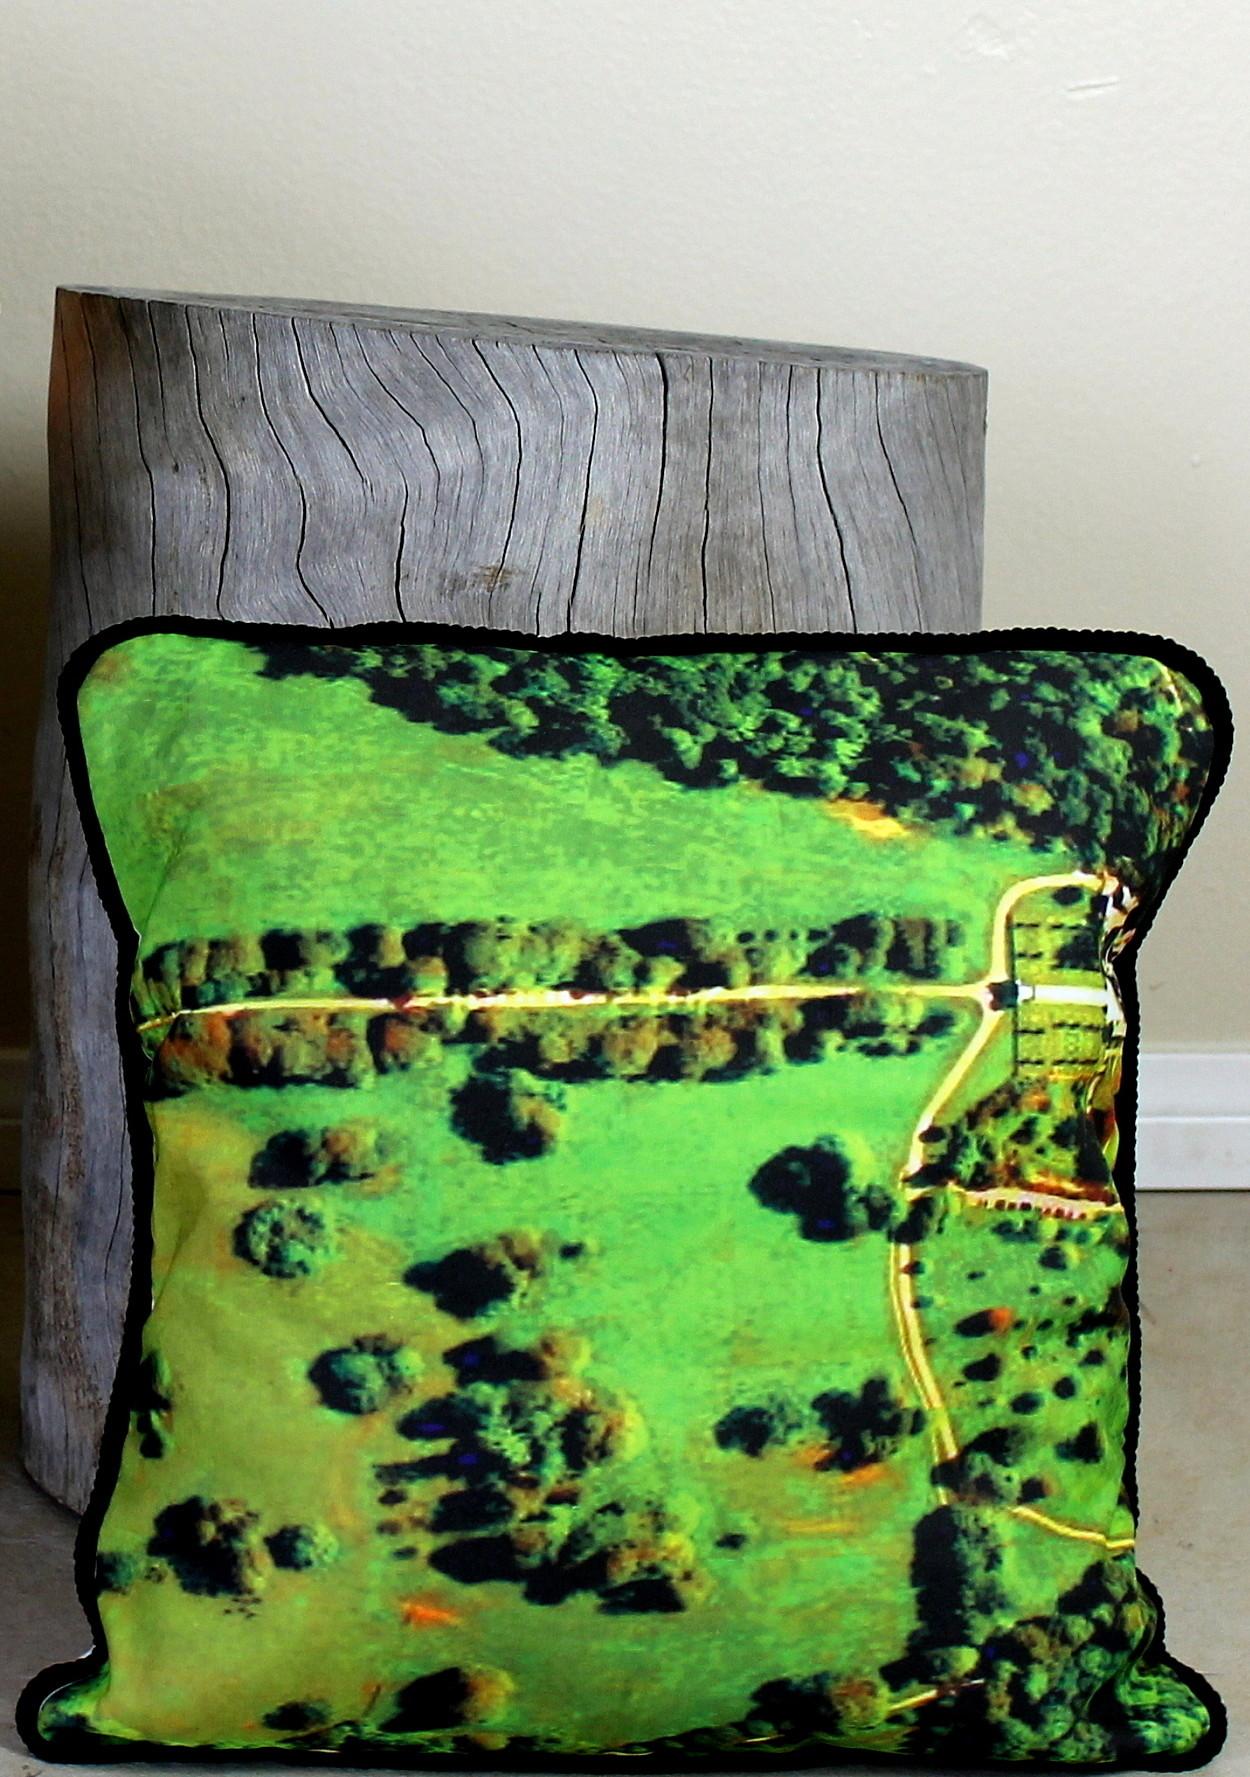 100 hullo pillow australian made organic buckwheat hull pil